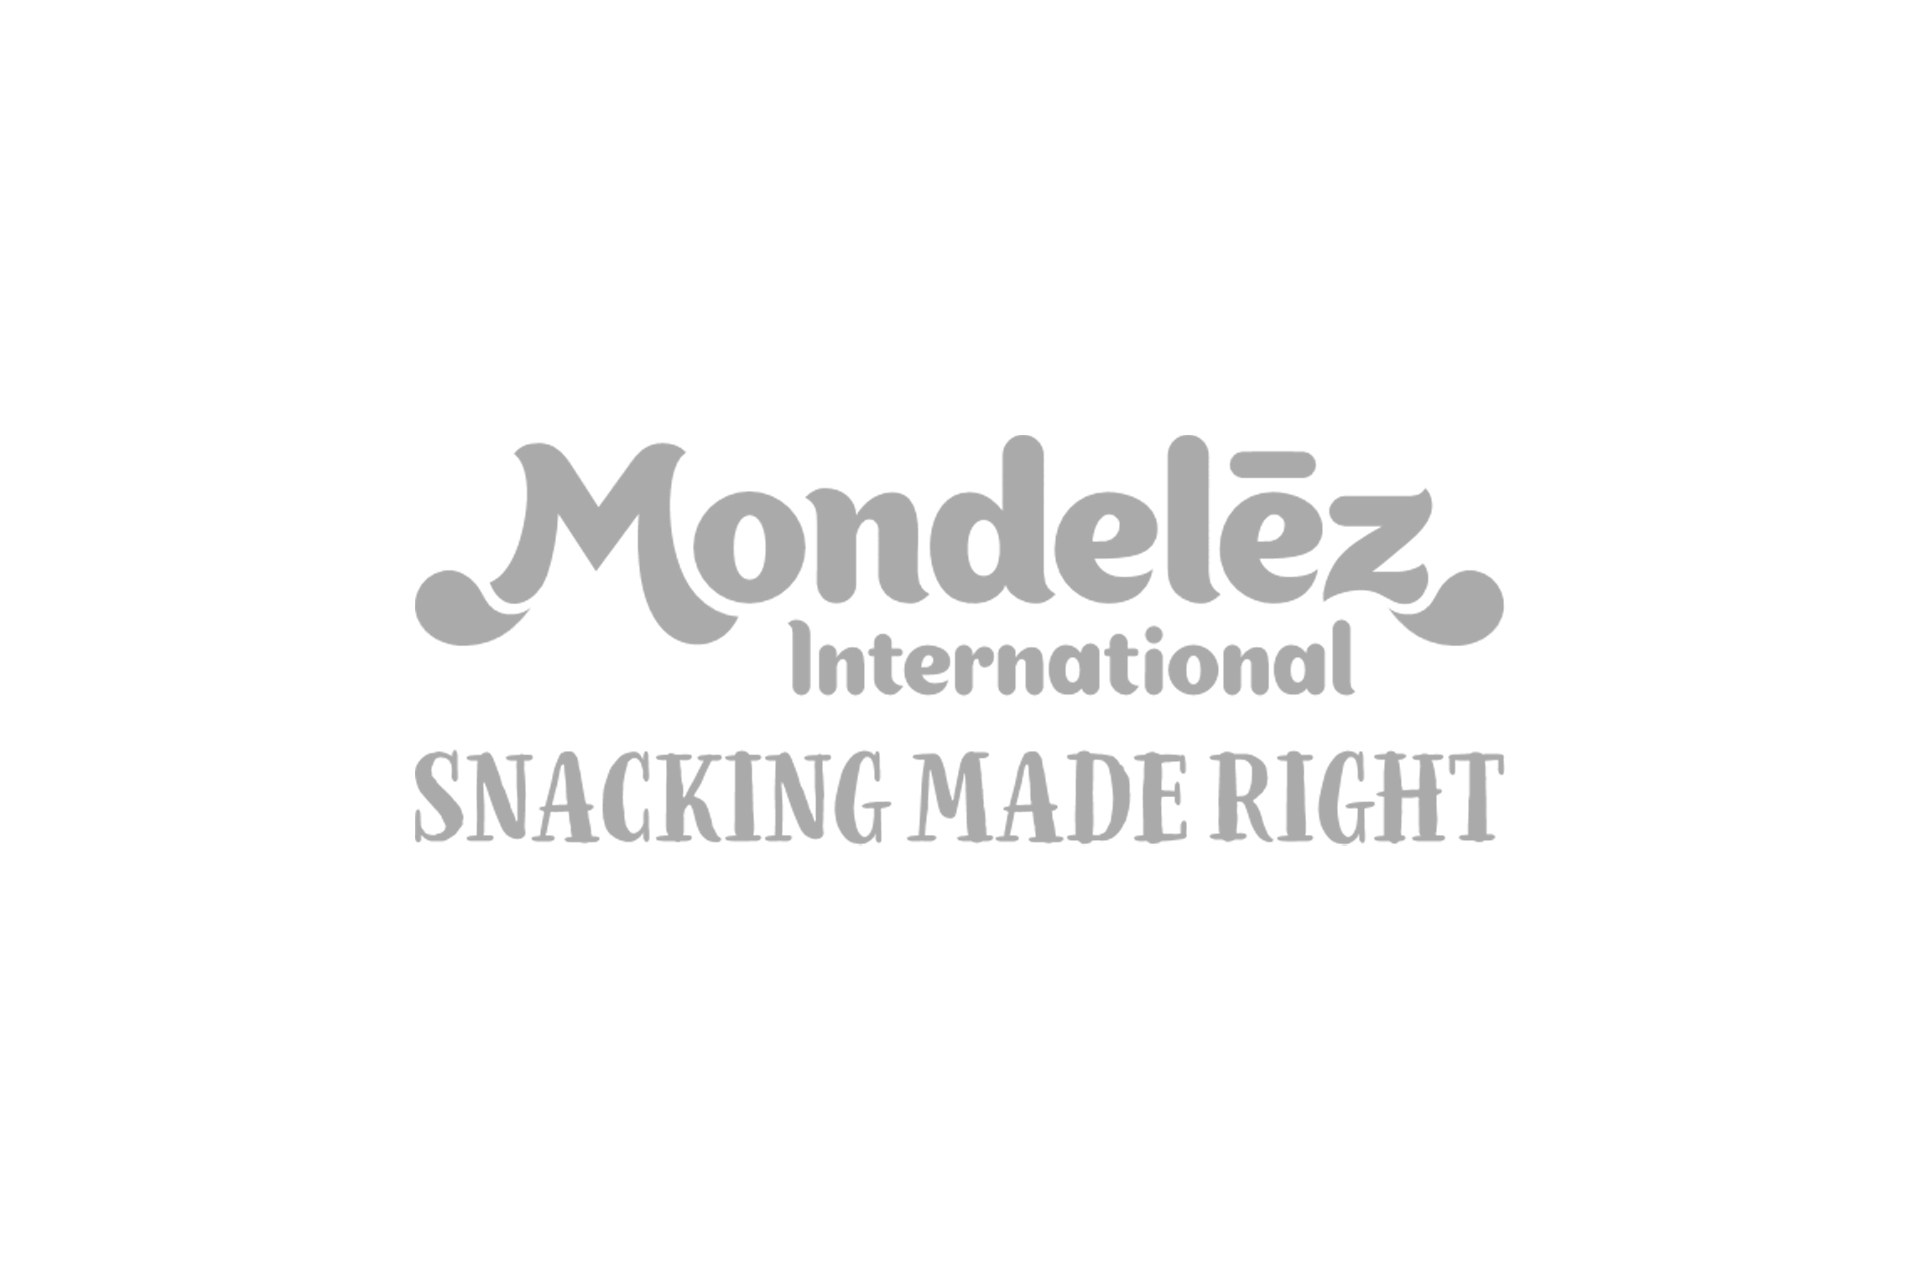 mondelez logo grey 2019